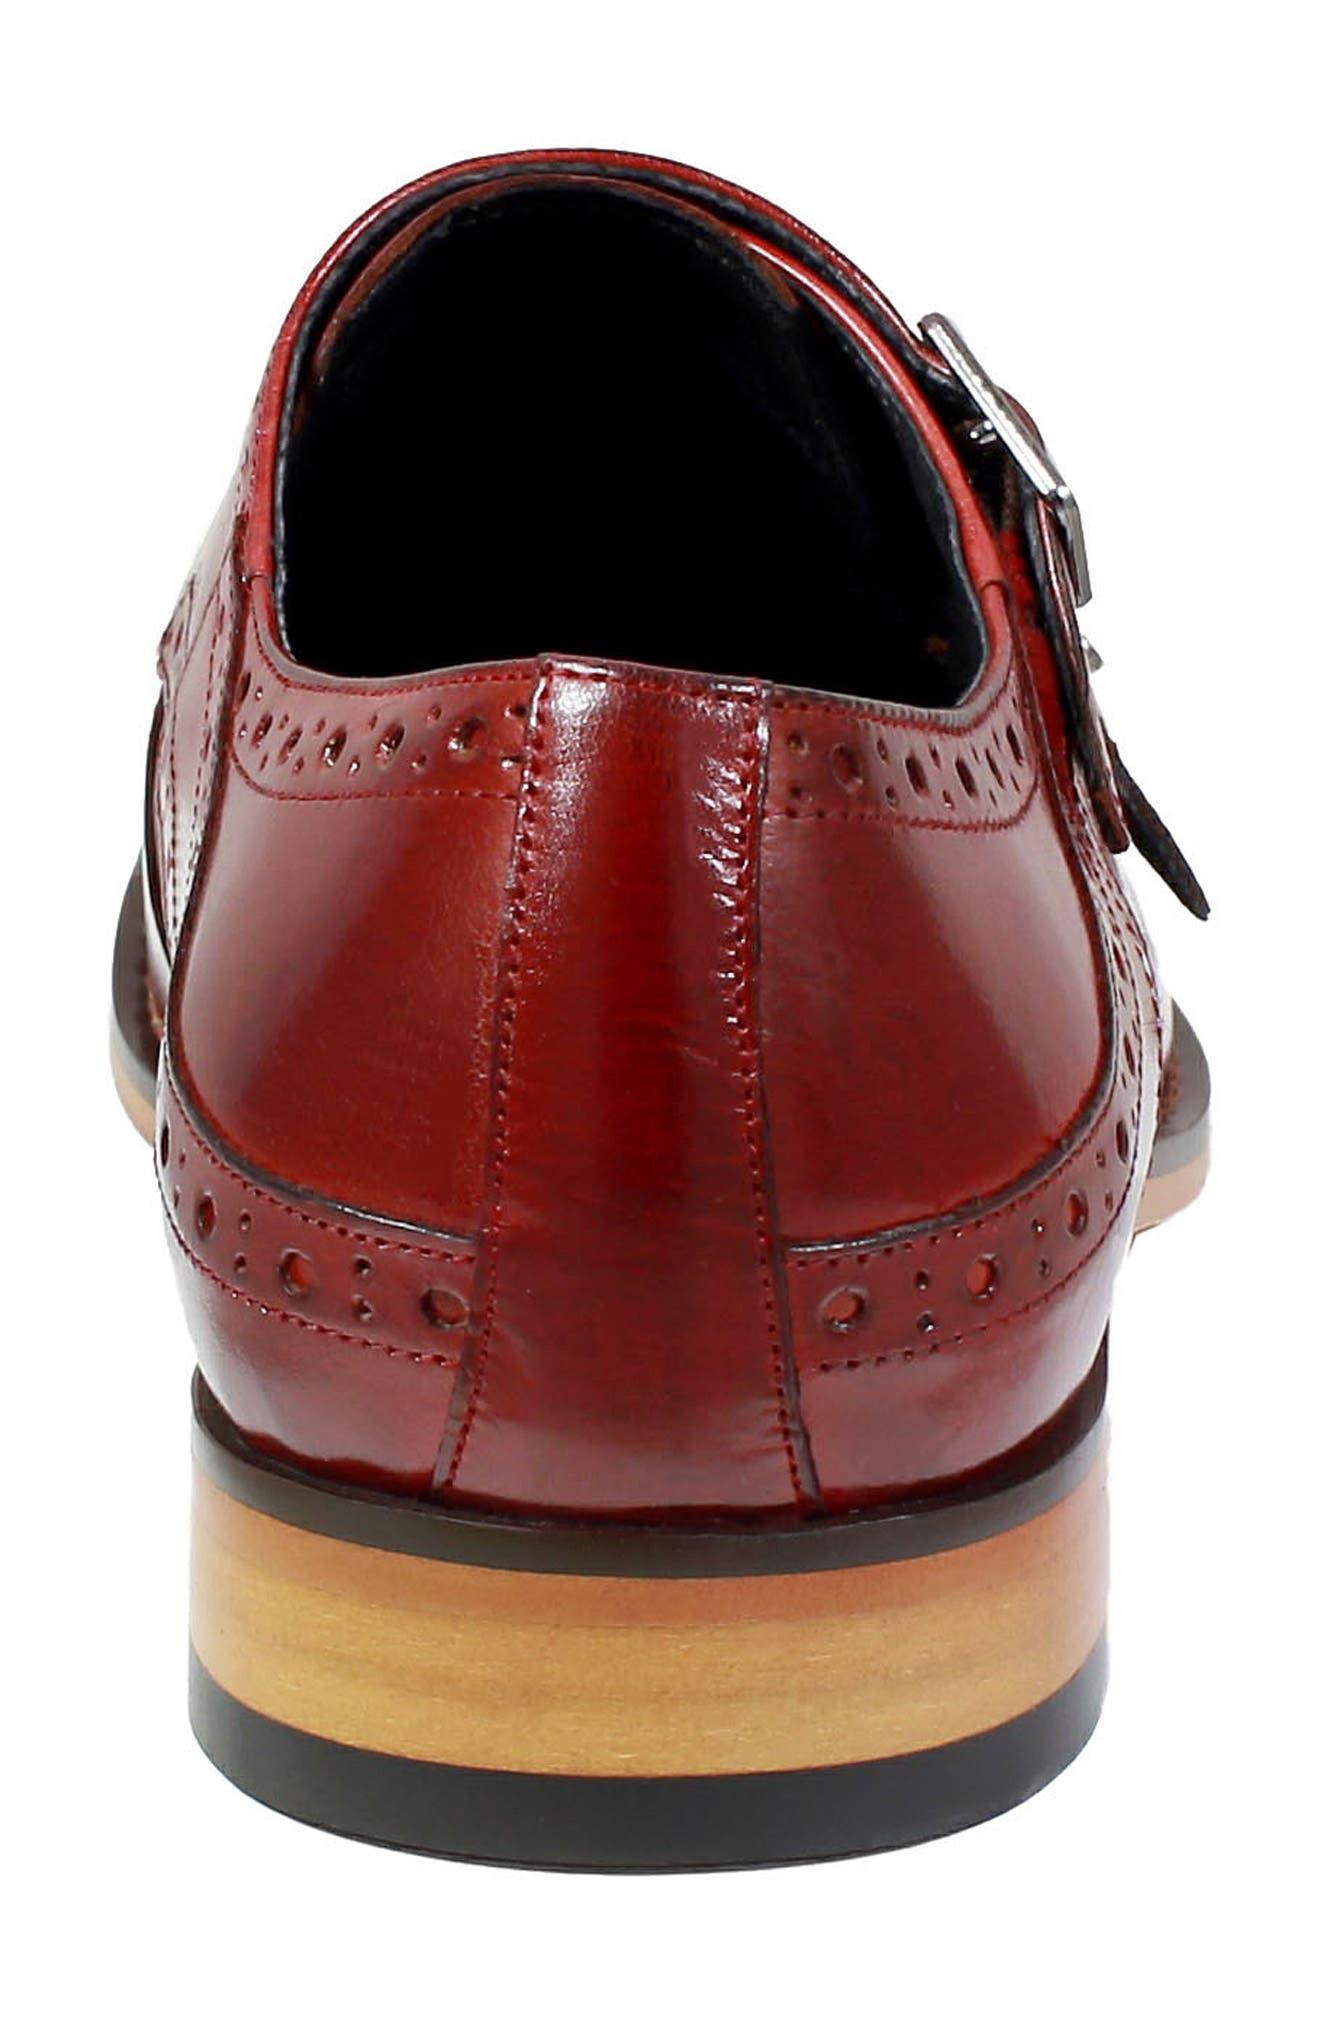 Tayton Cap Toe Double Strap Monk Shoe,                             Alternate thumbnail 7, color,                             RED LEATHER